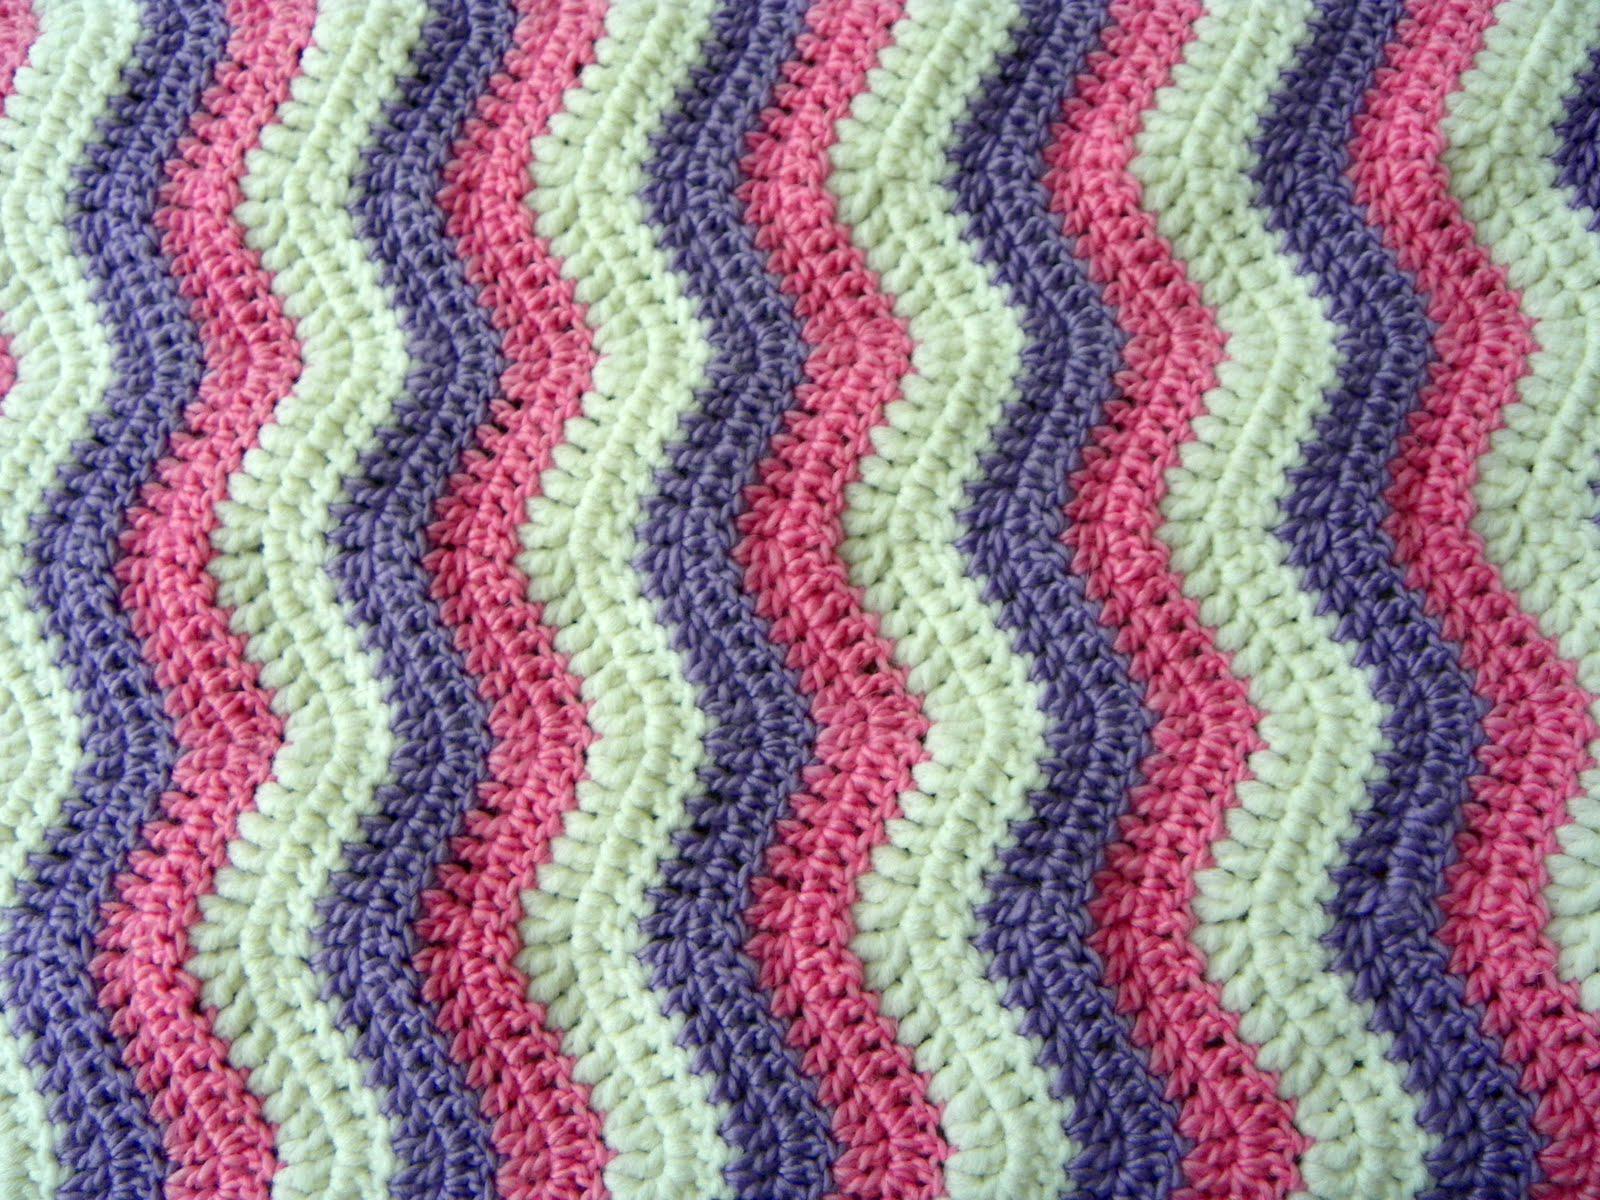 Life in colour: Baby Ripple Blanket - ta-dah!